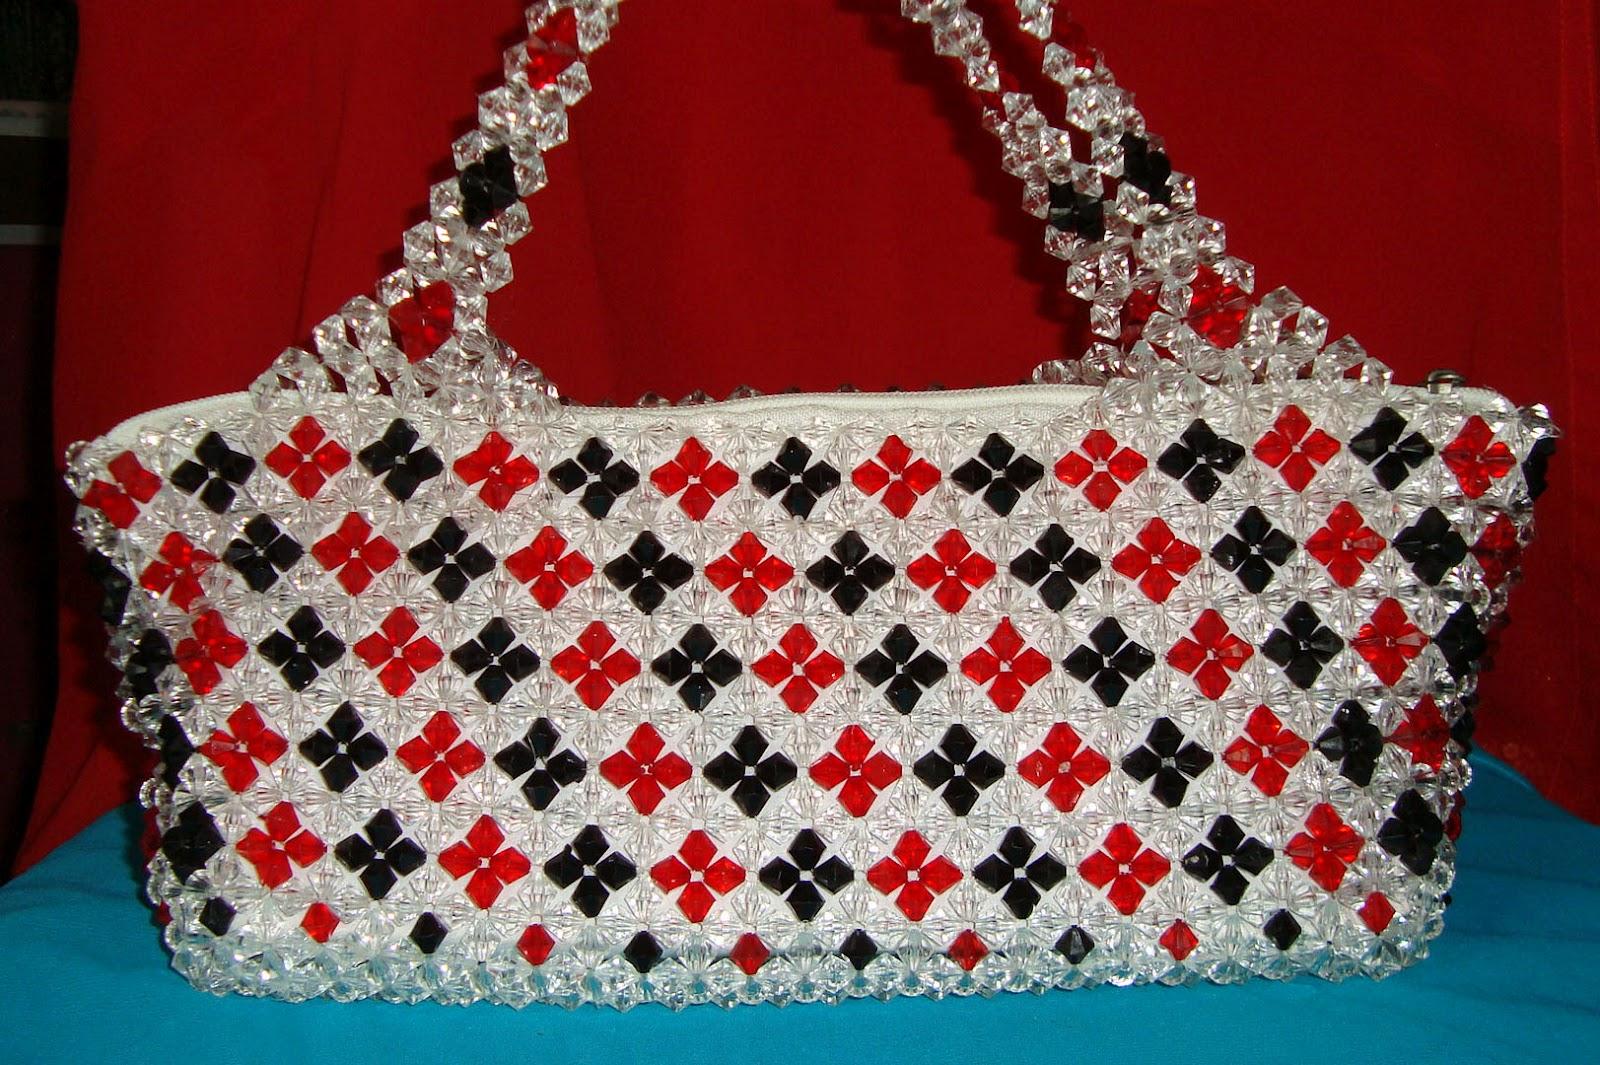 how to make beaded handbags